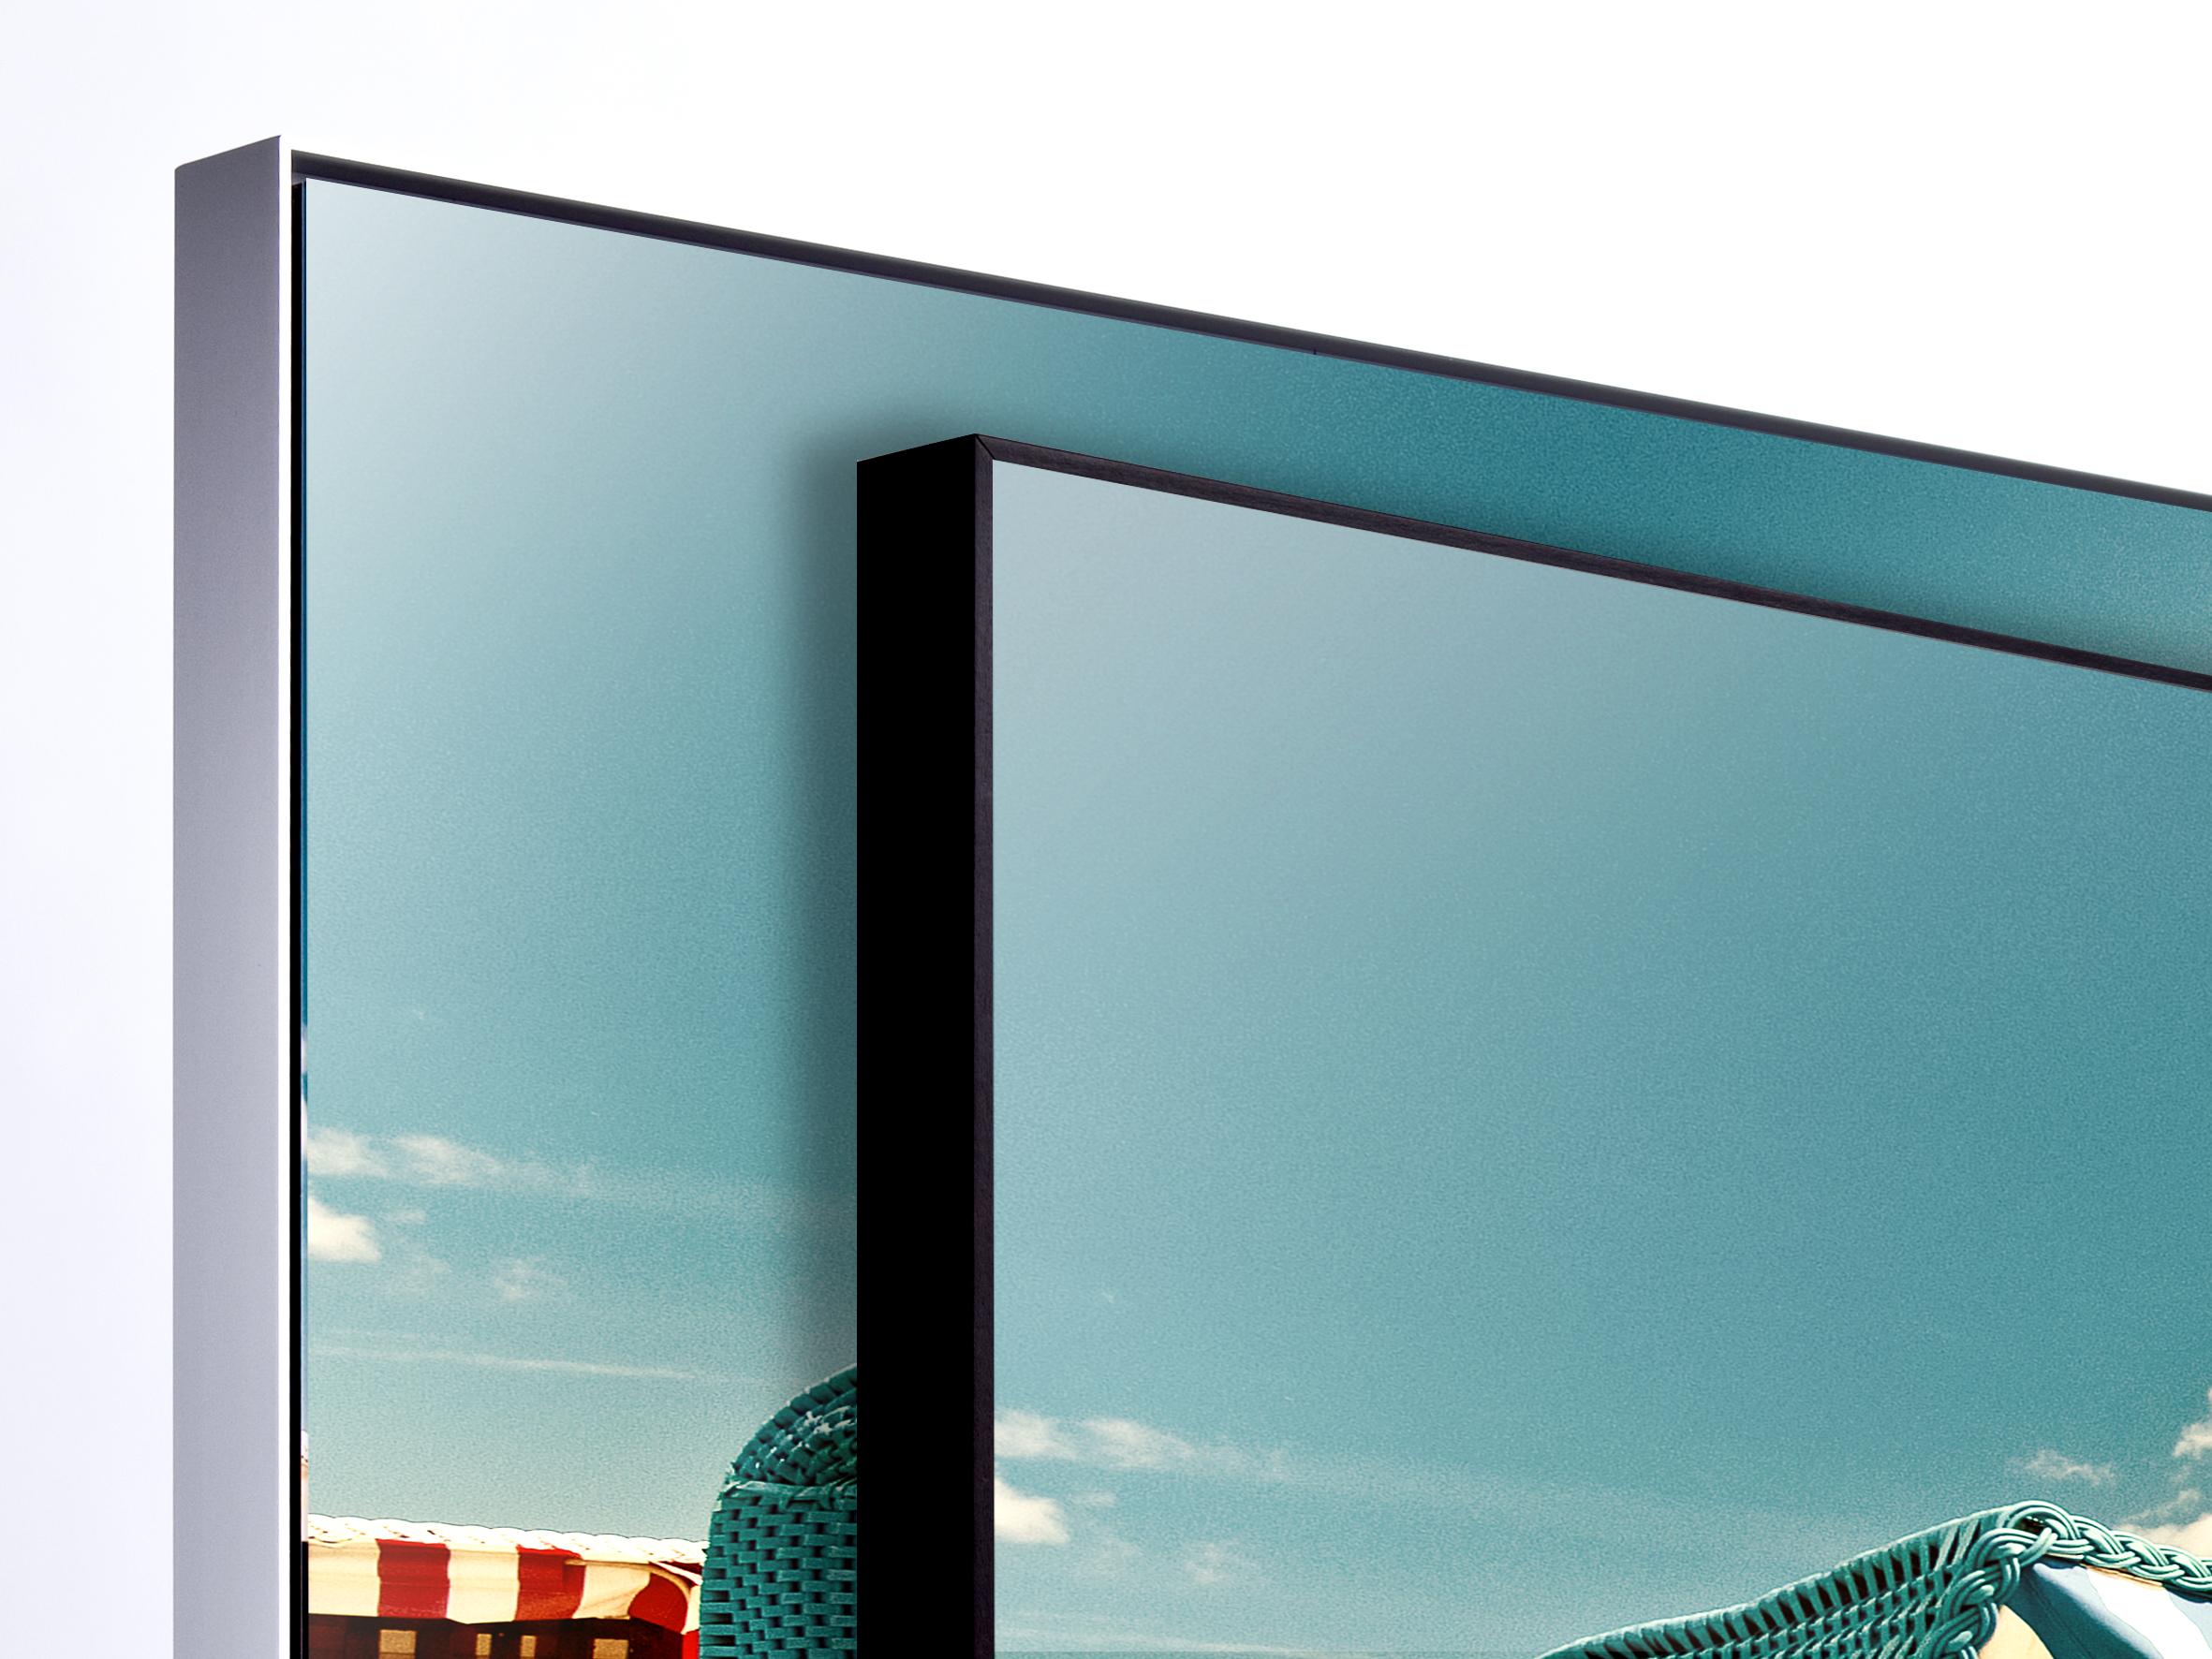 foto bilderrahmen im interview jan ole schmidt whitewall. Black Bedroom Furniture Sets. Home Design Ideas